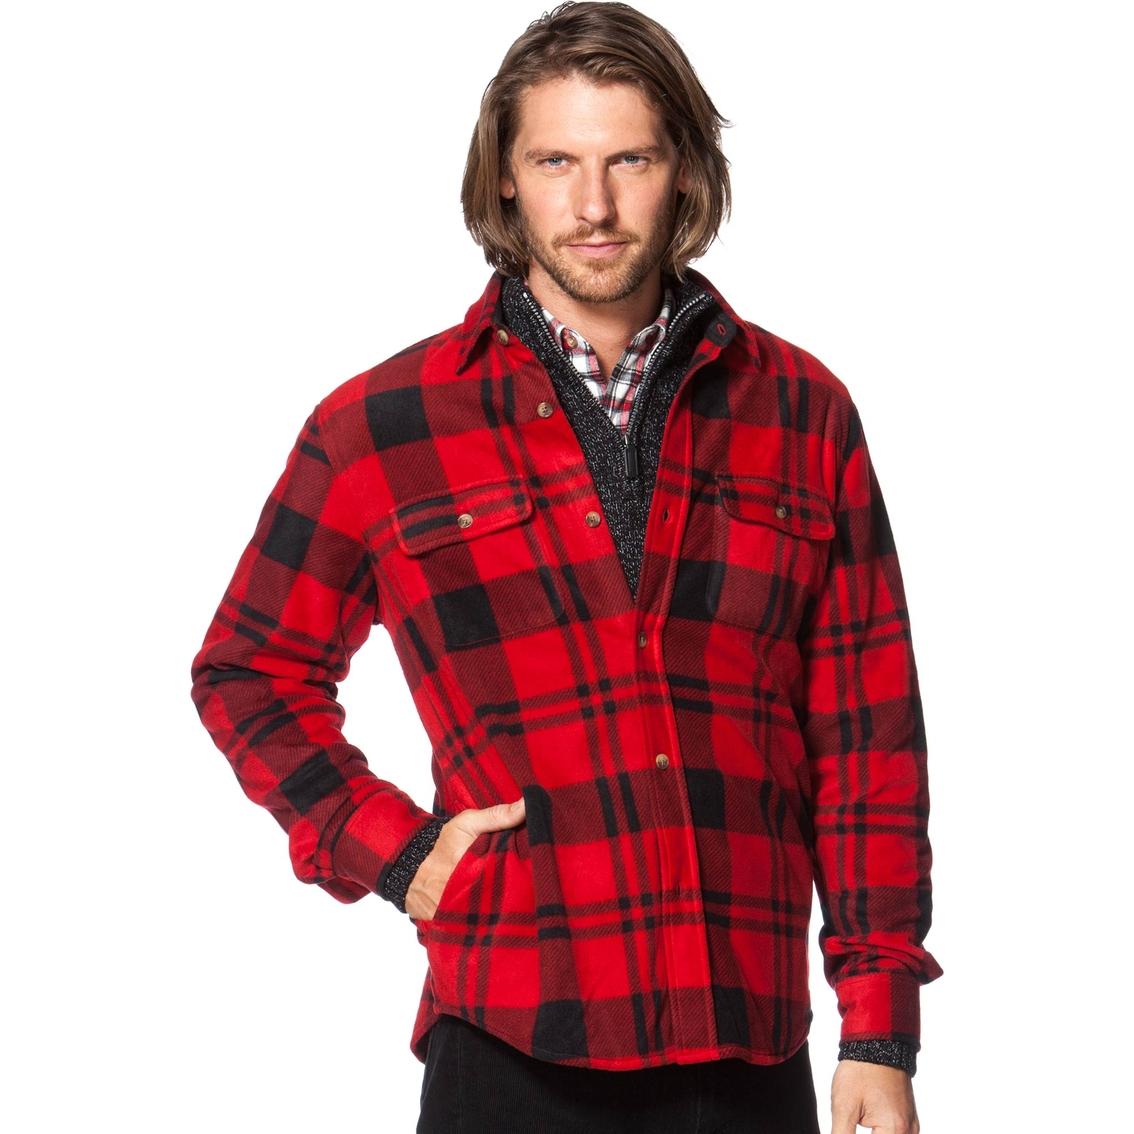 ce00102b3d5 Chaps Buffalo Plaid Fleece Shirt Jacket